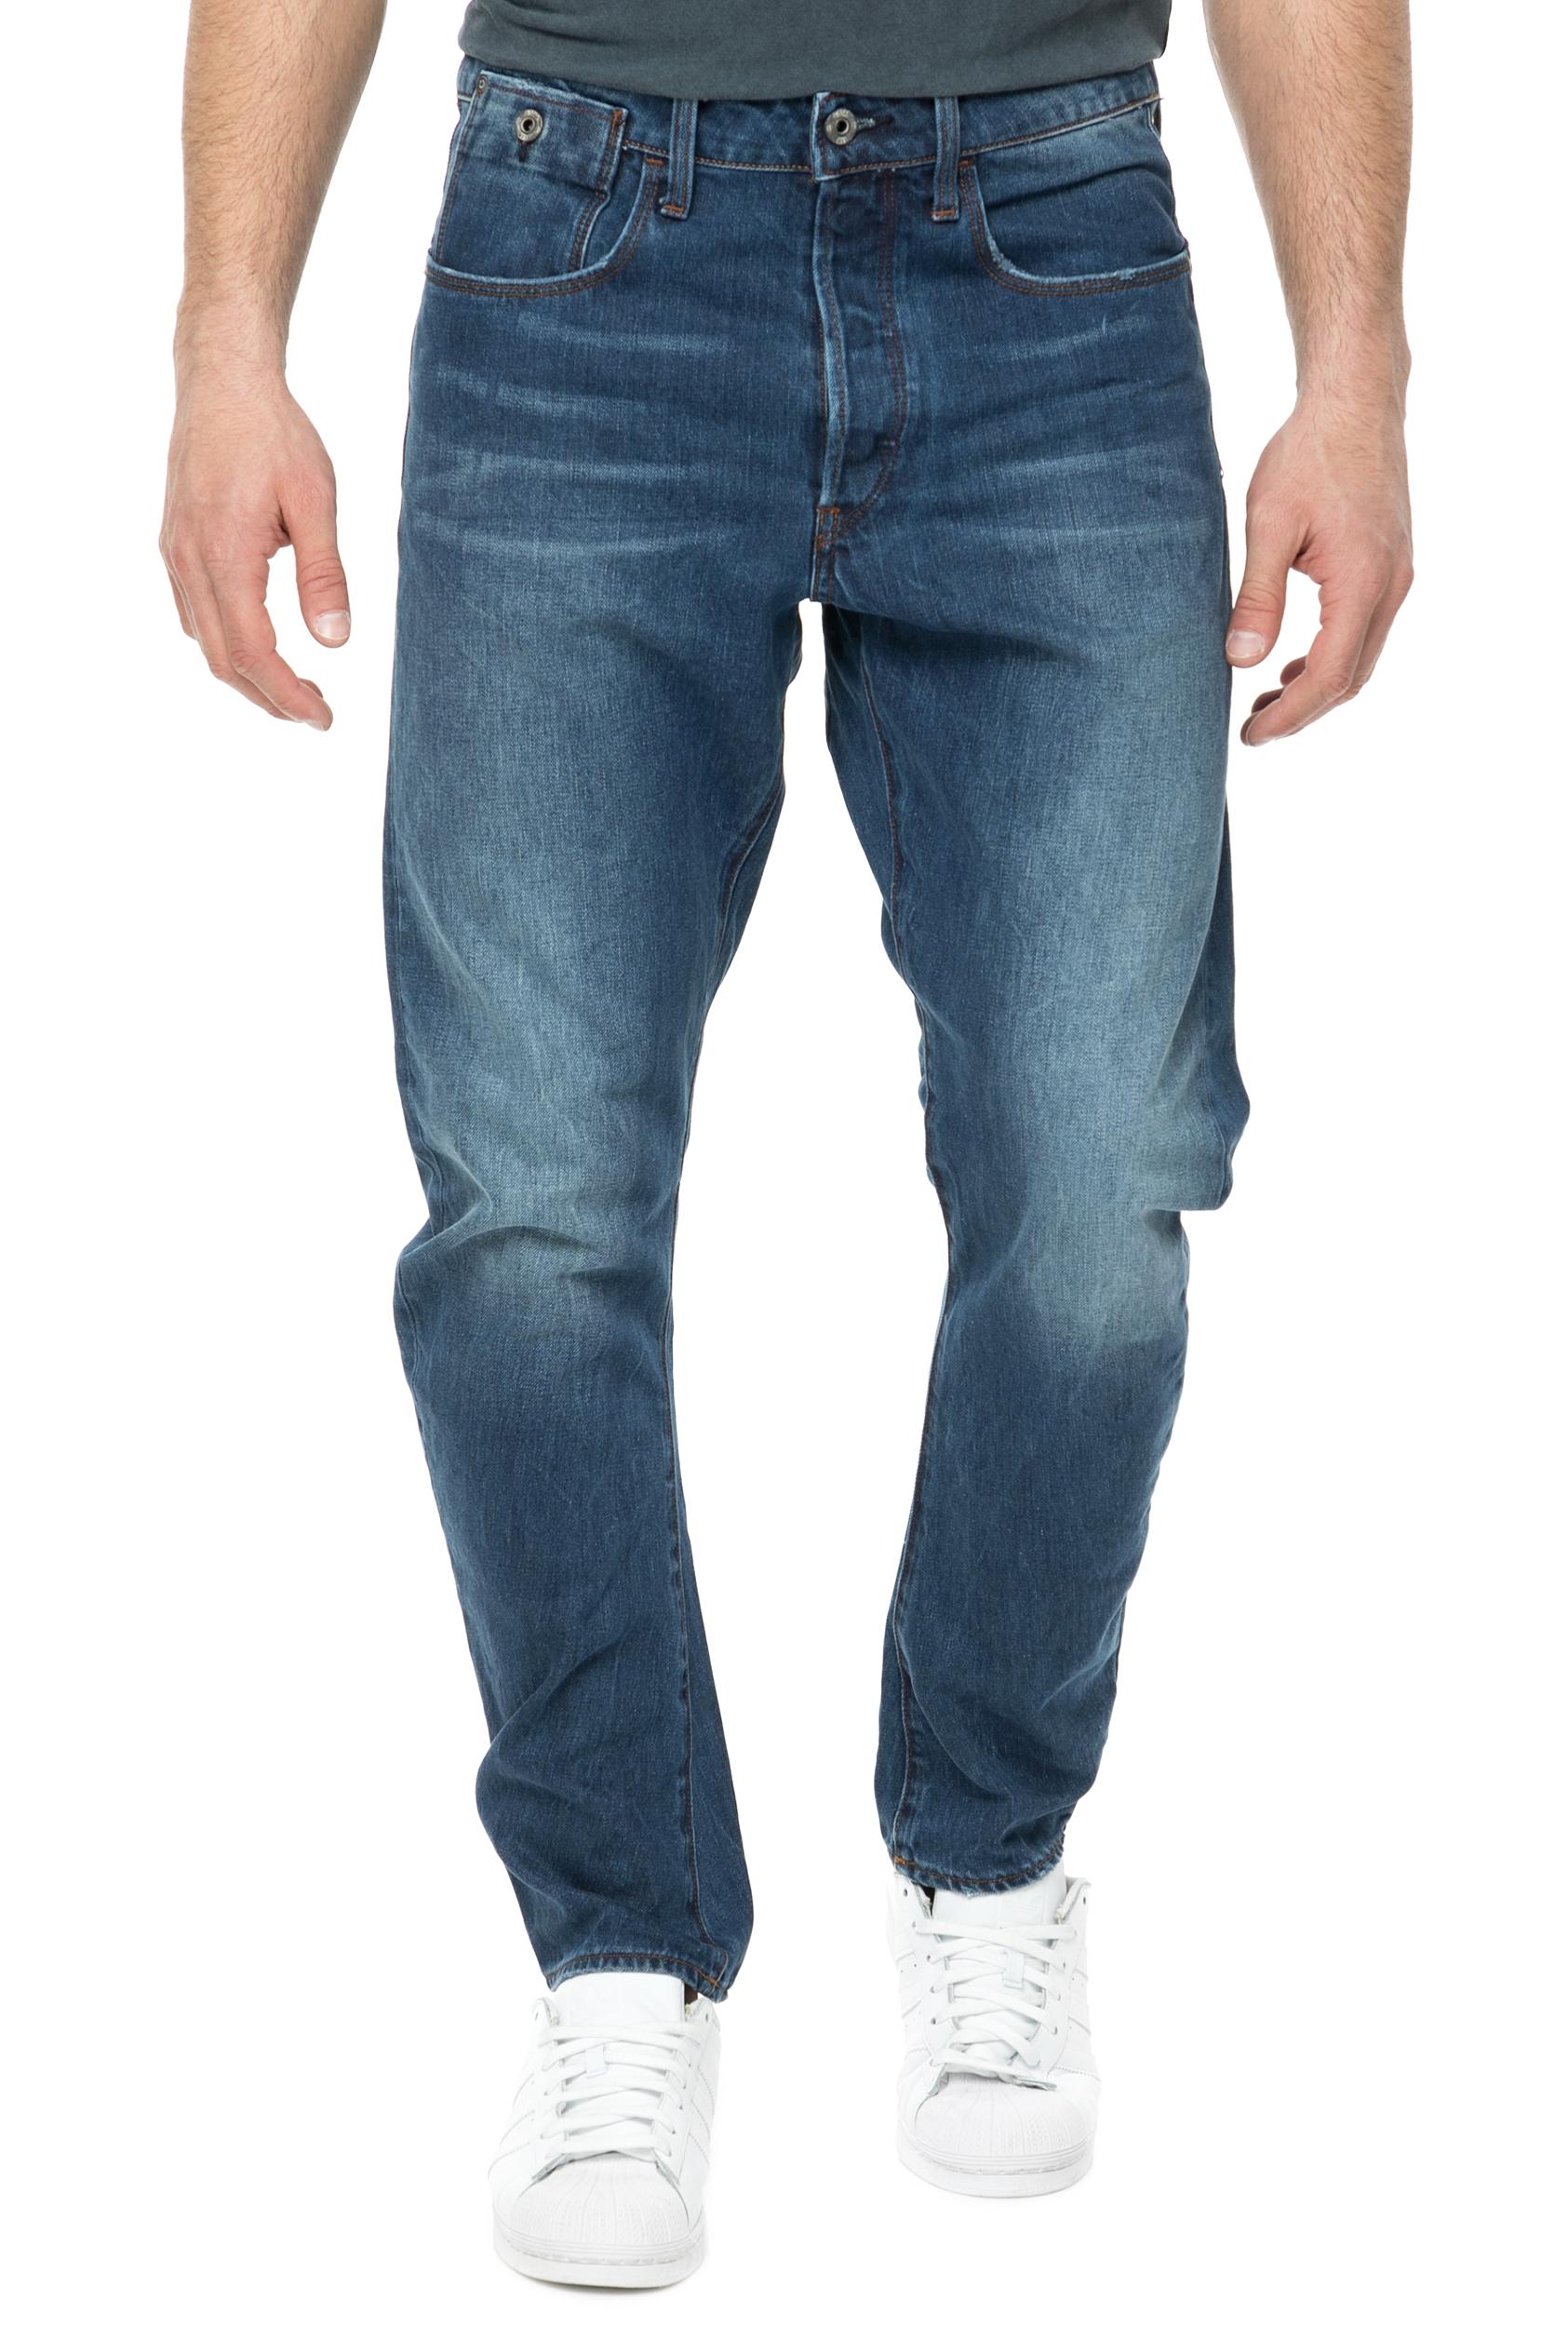 cc2dc040e8c G-STAR RAW - Ανδρικό τζιν παντελόνι G-STAR RAW 3d tapered μπλε